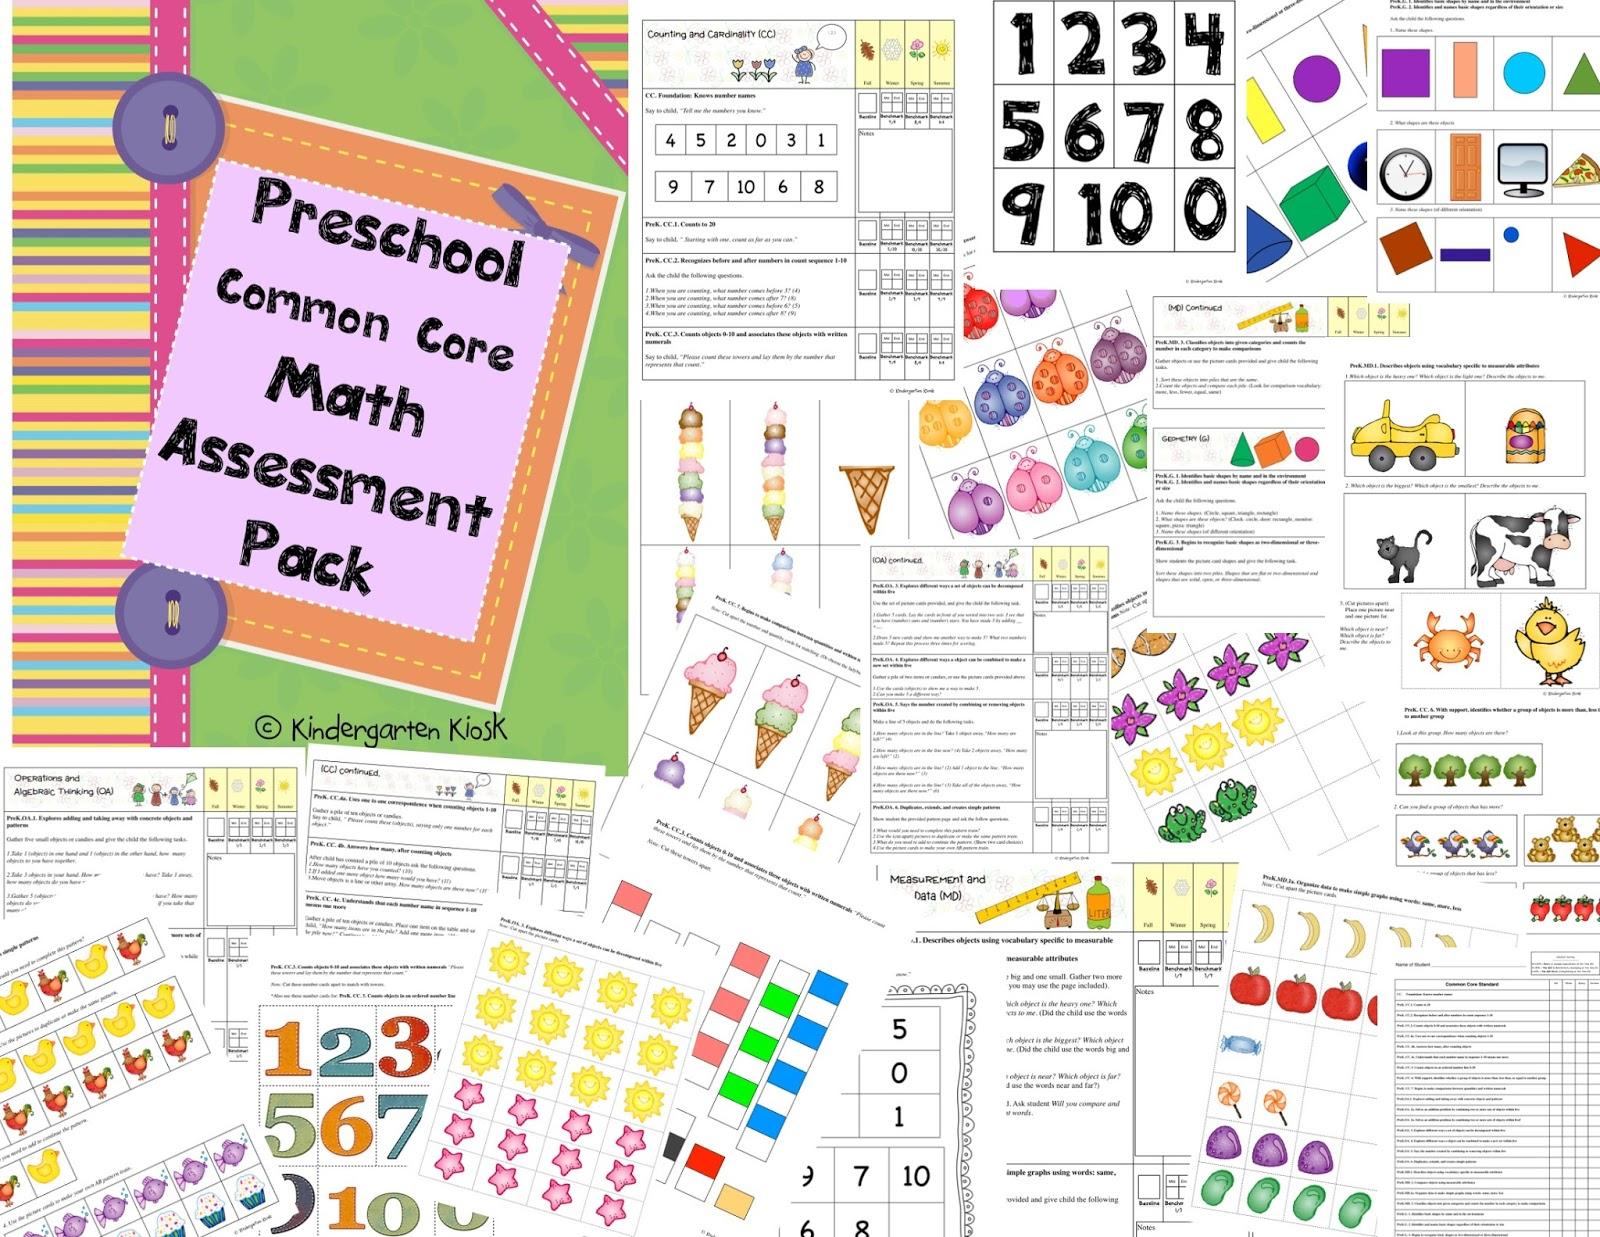 Kindergarten Kiosk Preschool Common Core Assessments